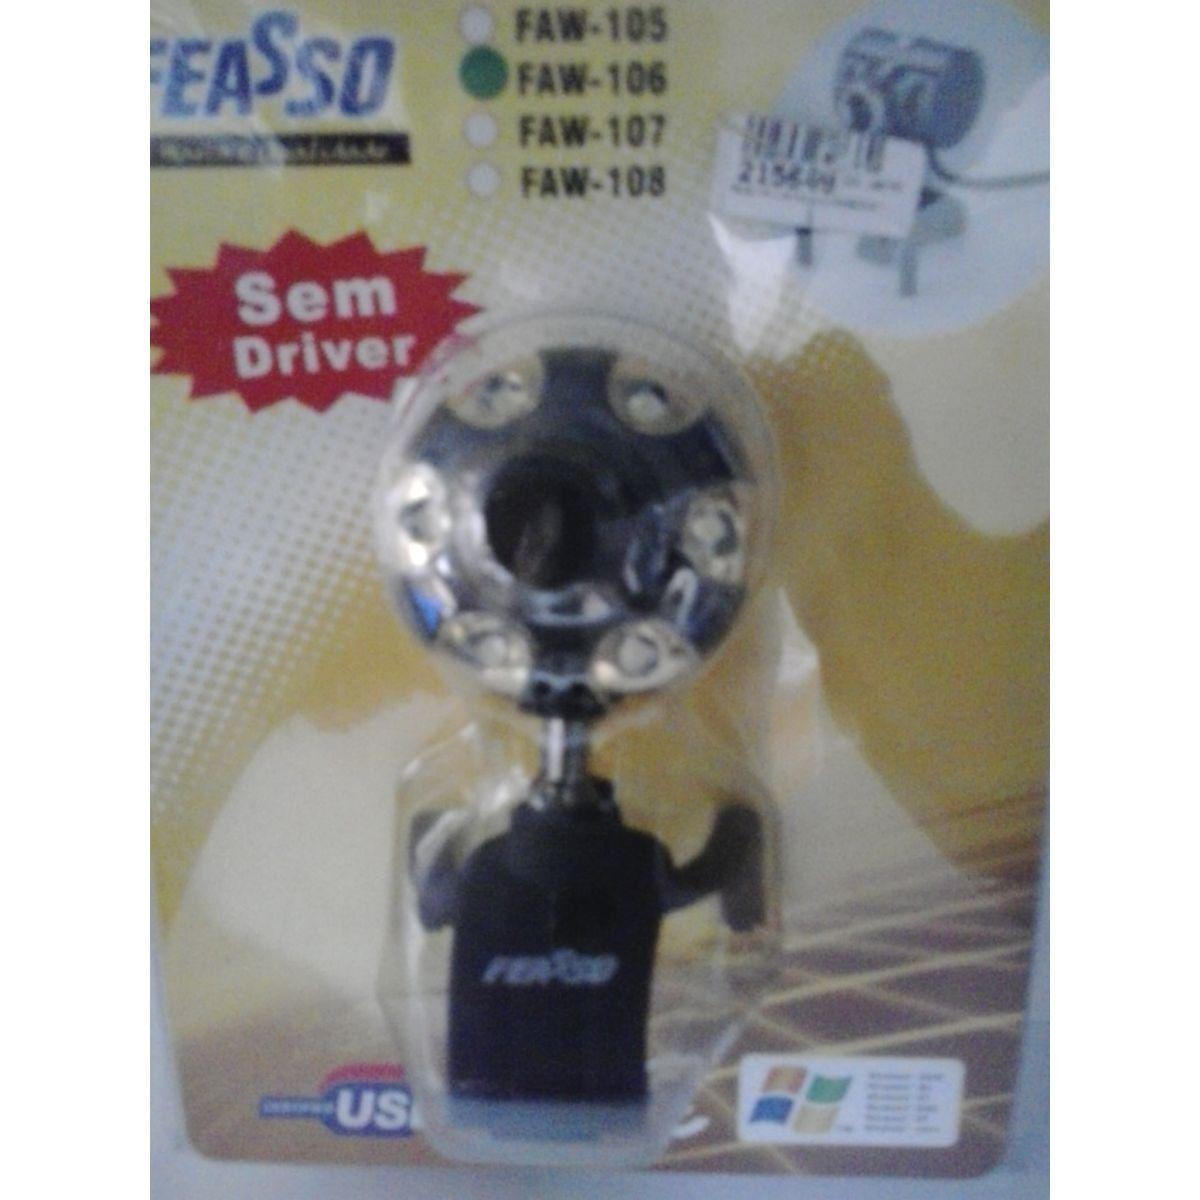 Webcam 1.3m Feasso Faweb106